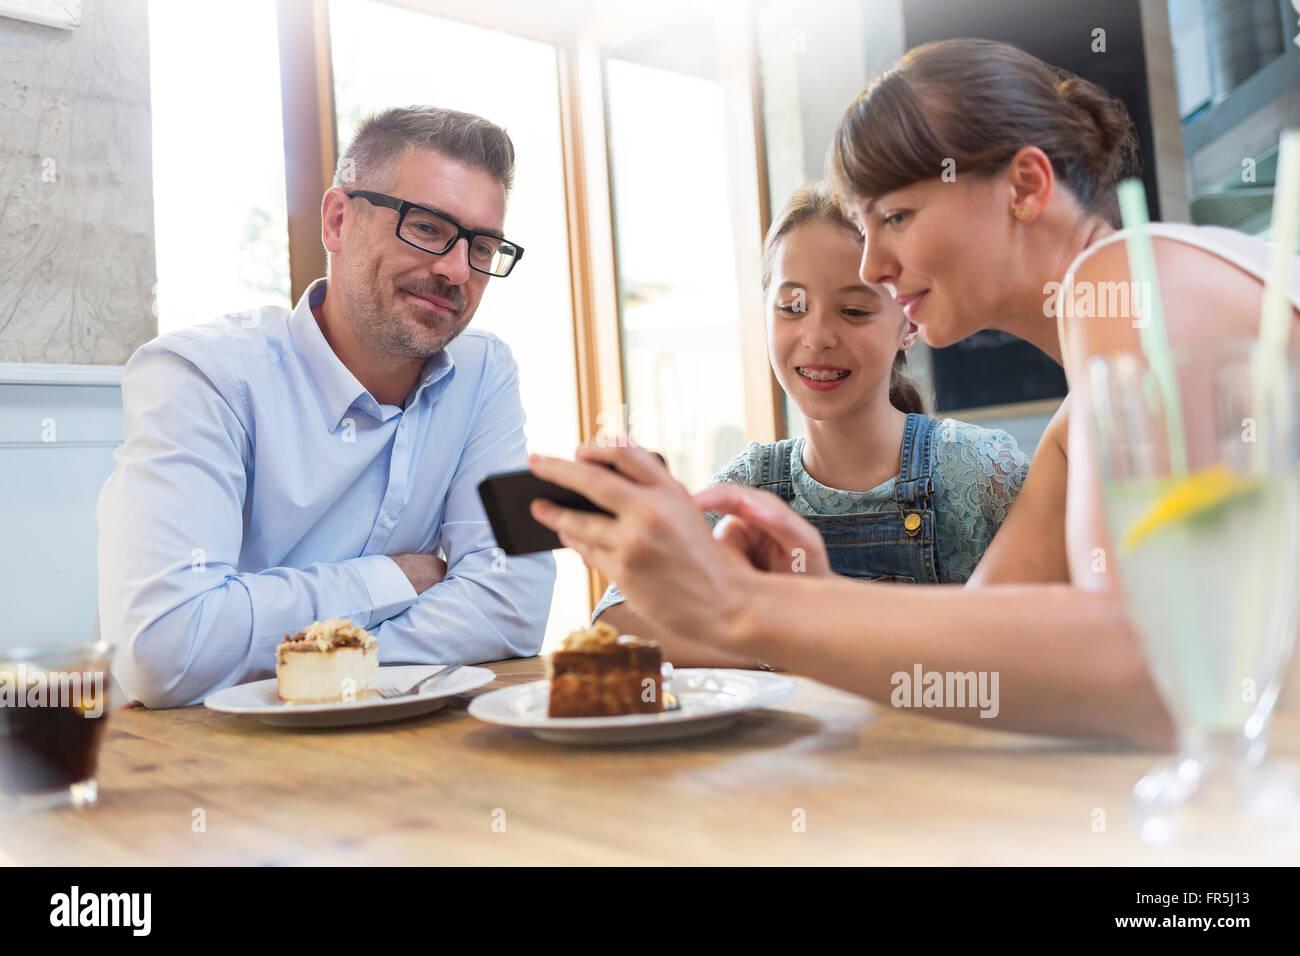 Famille avec cell phone manger dessert au cafe table Banque D'Images